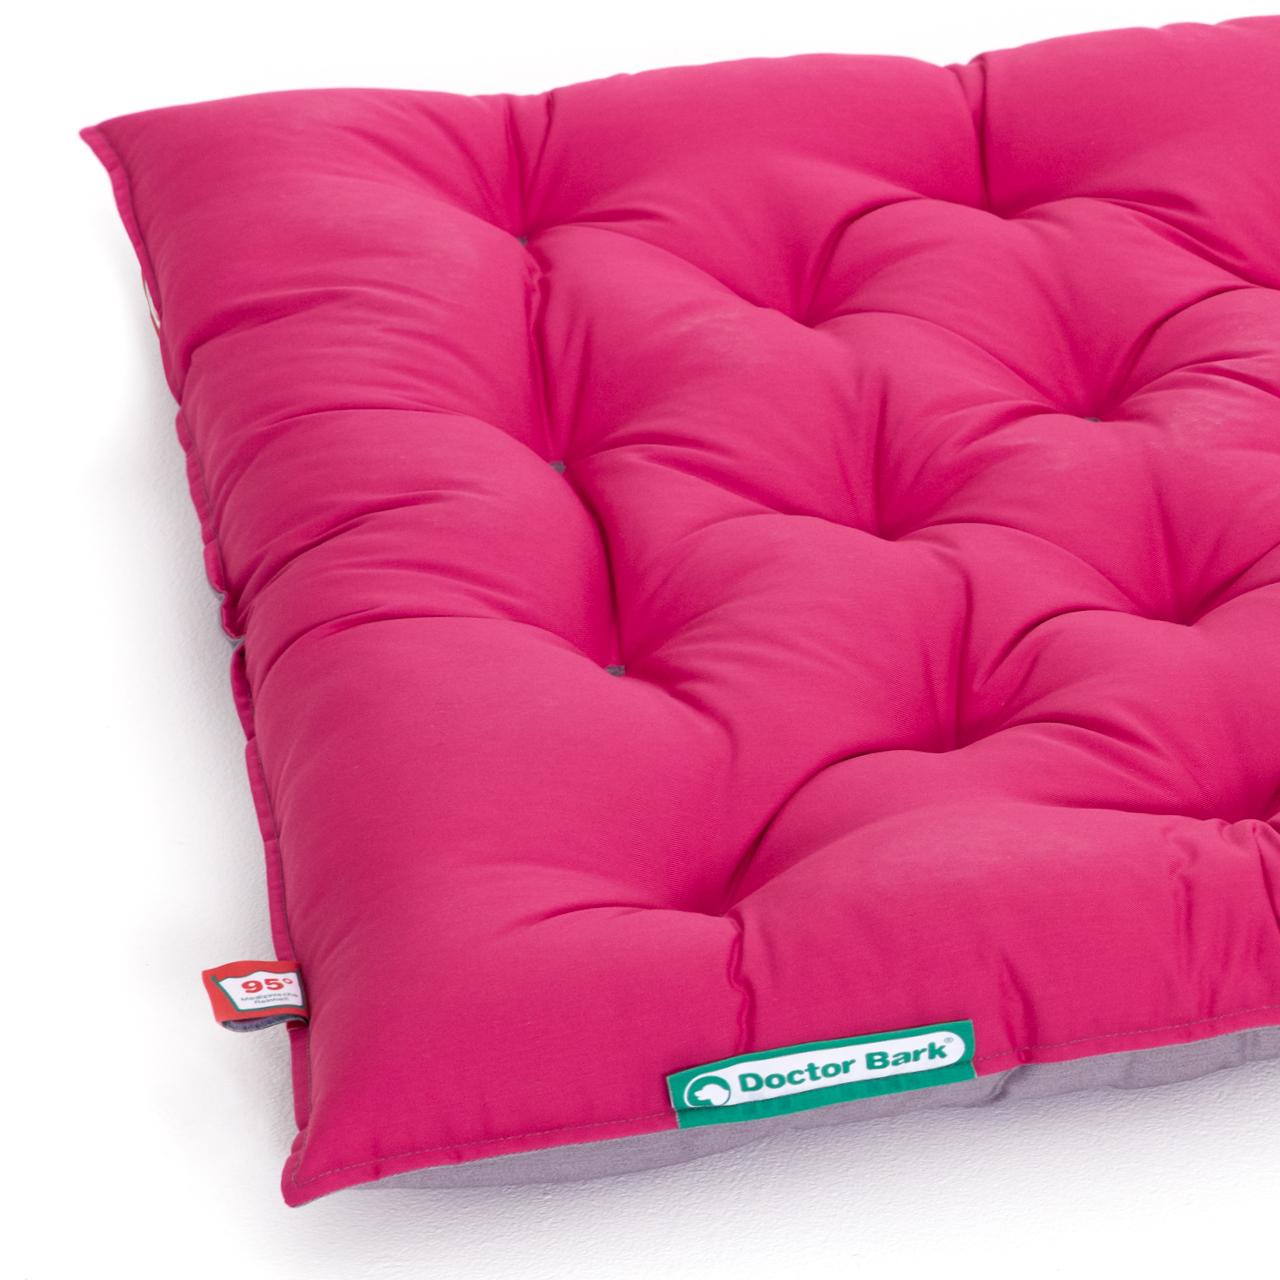 Hundekissen URBAN platingrau - hot pink XL